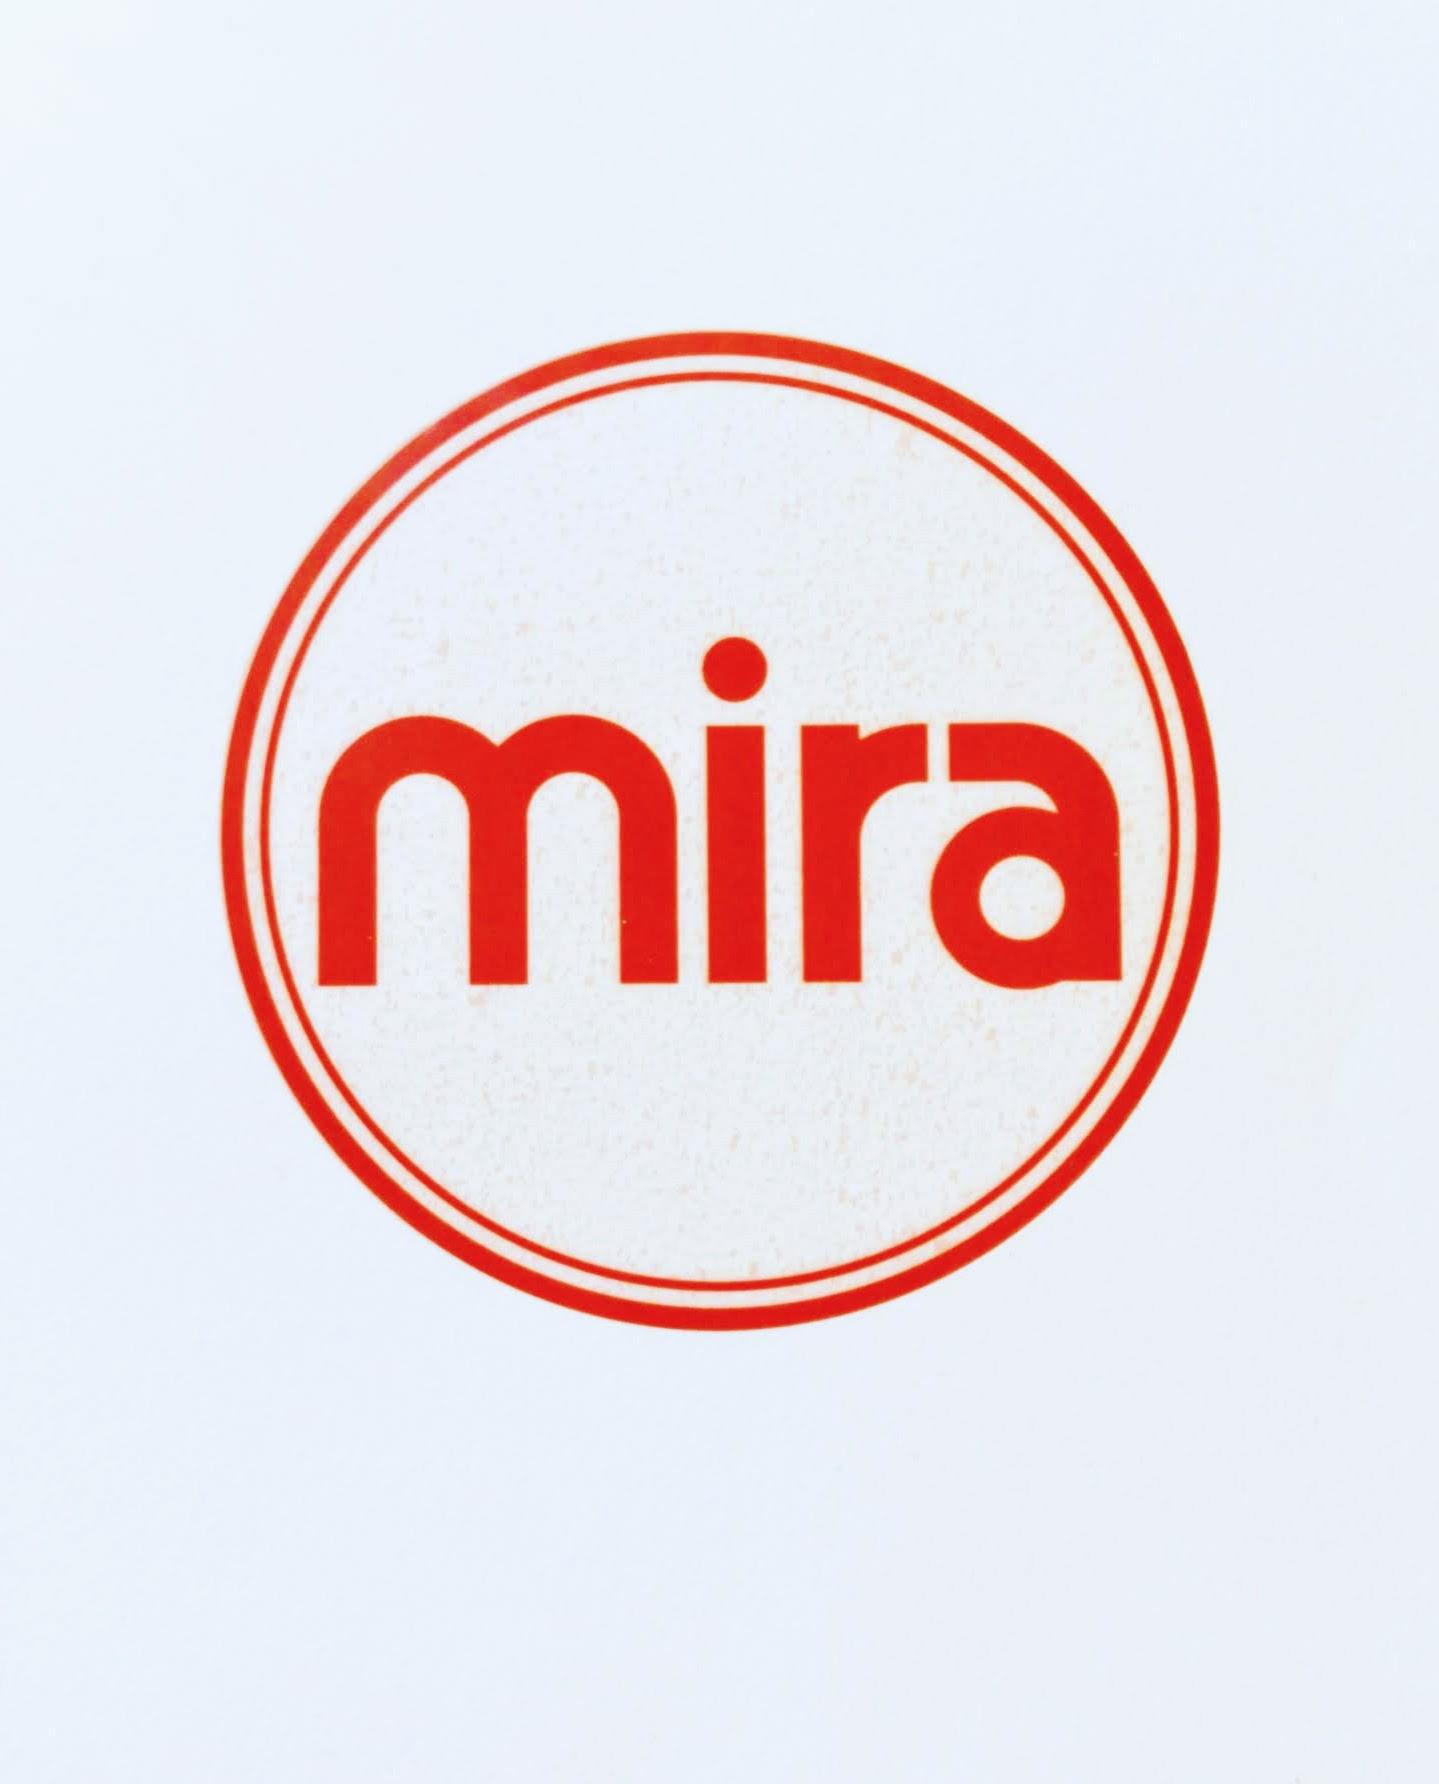 AutocollantMiraBlanc.jpg